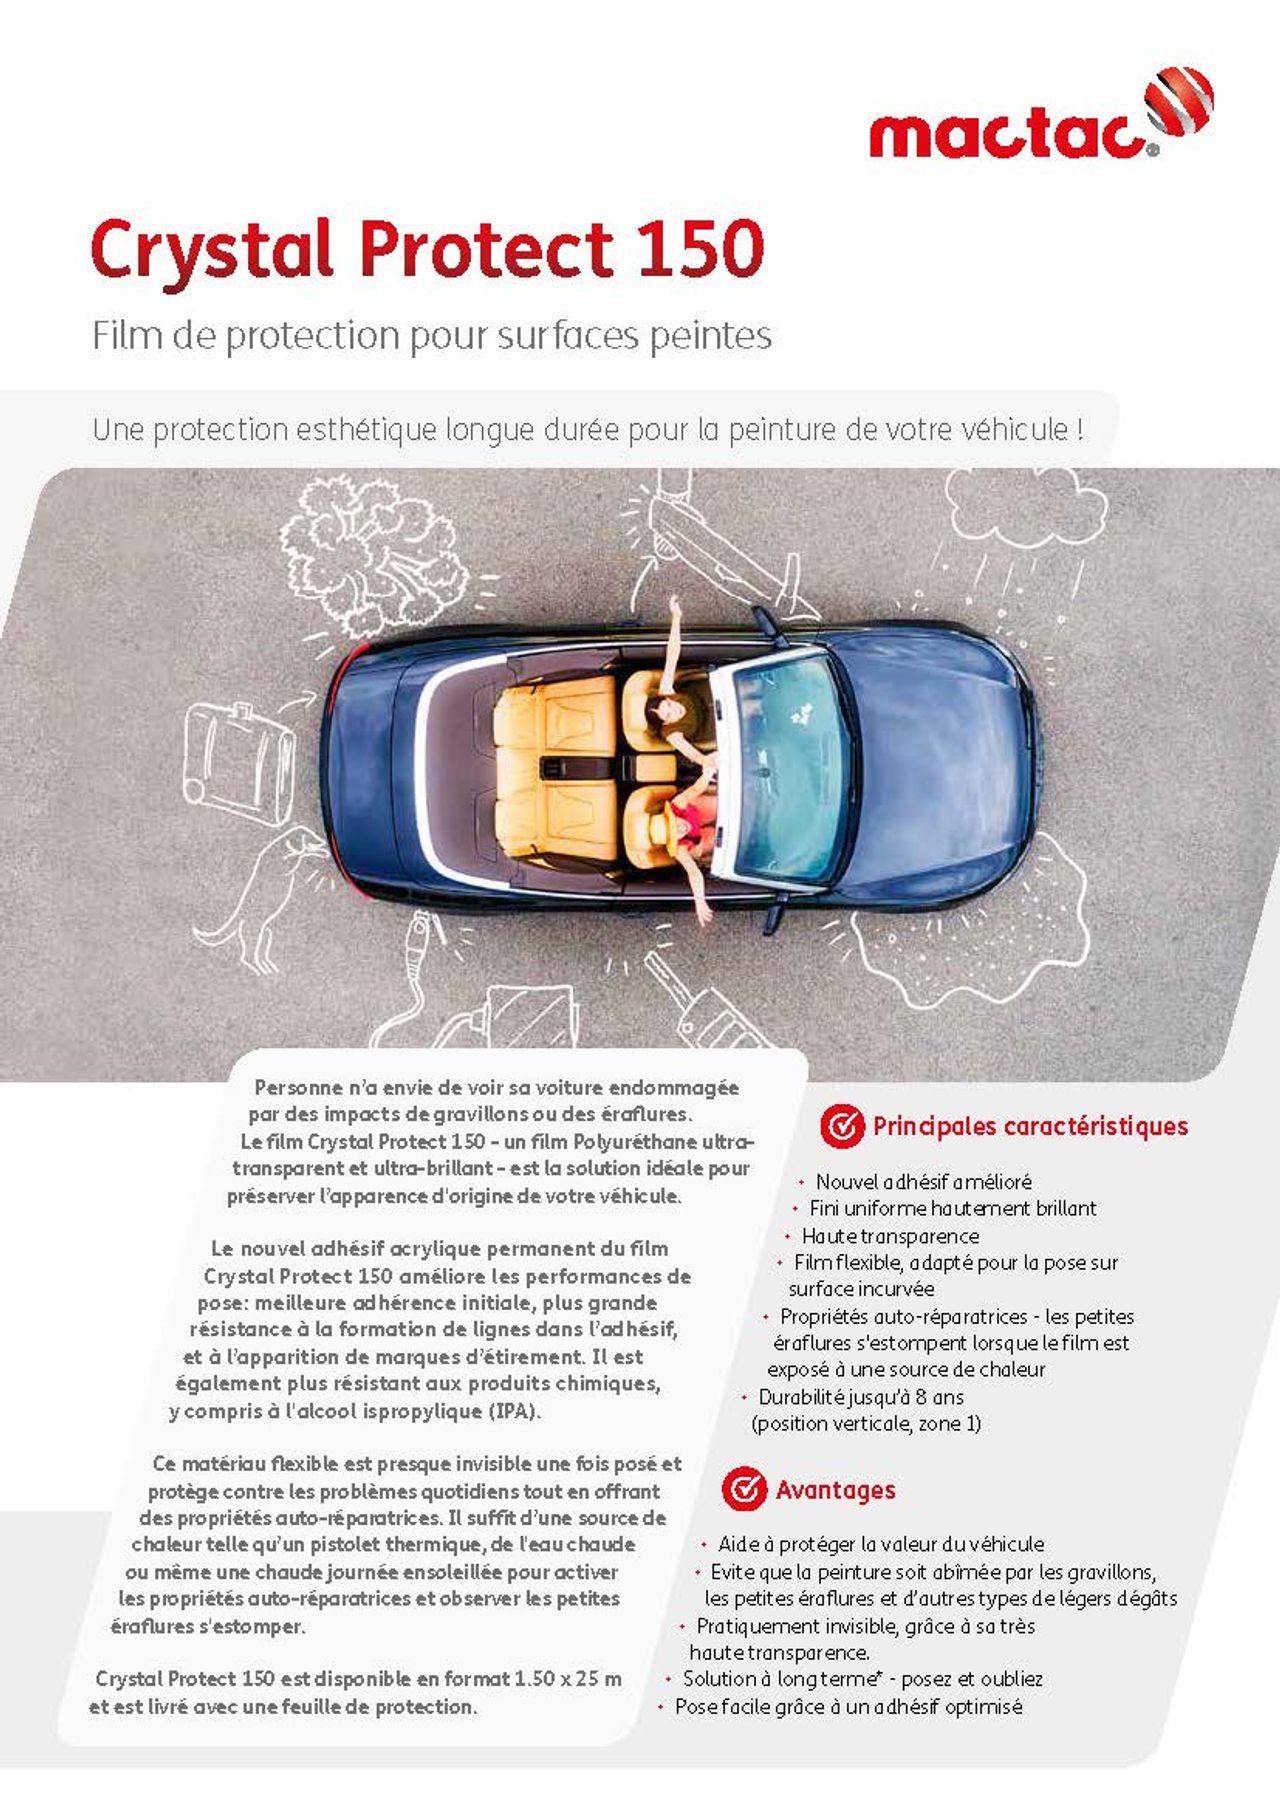 Imag Crystal Protect 150 brochure